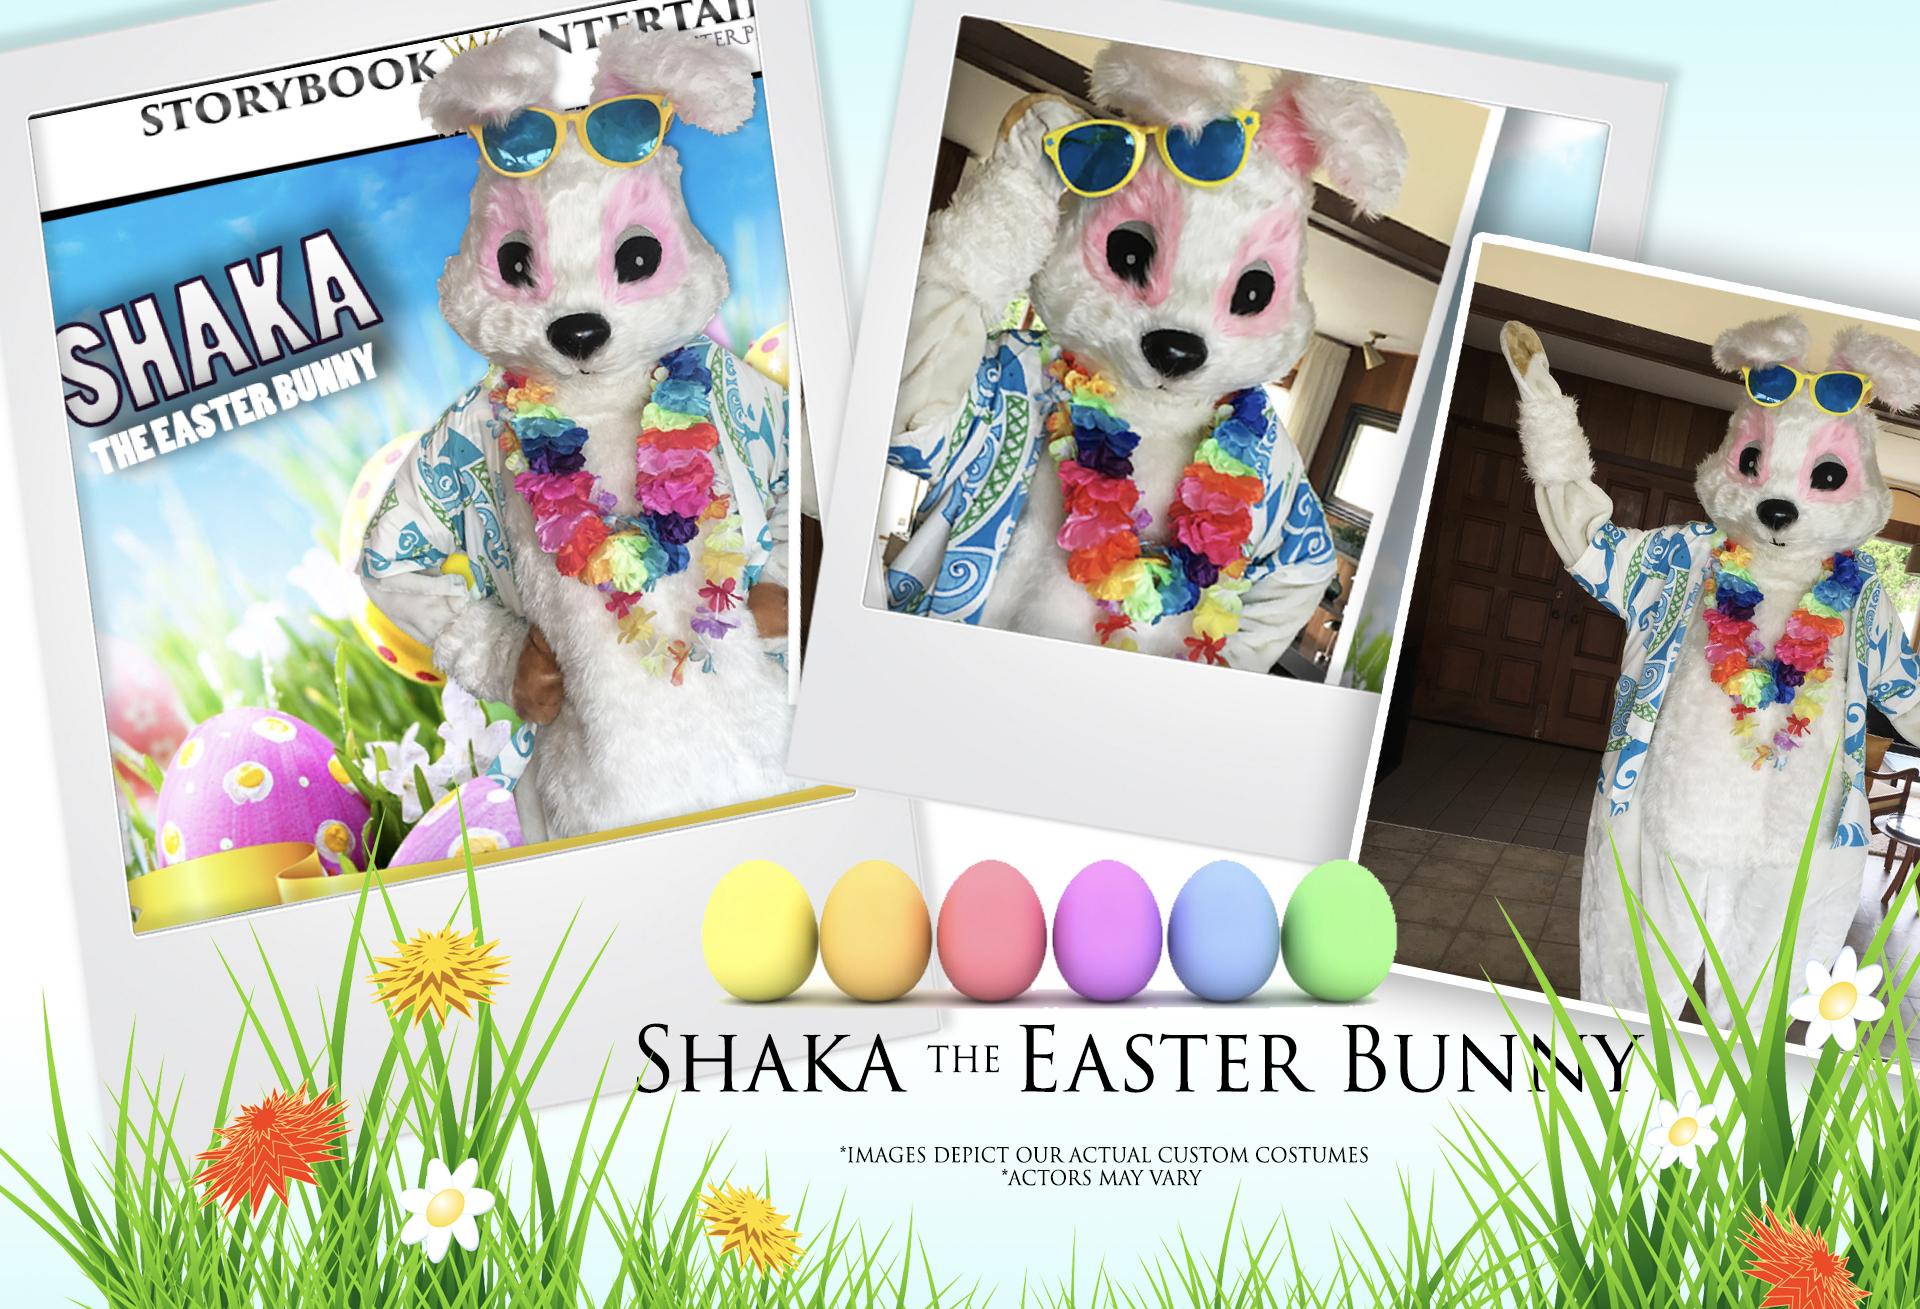 Shake the Easter Bunny